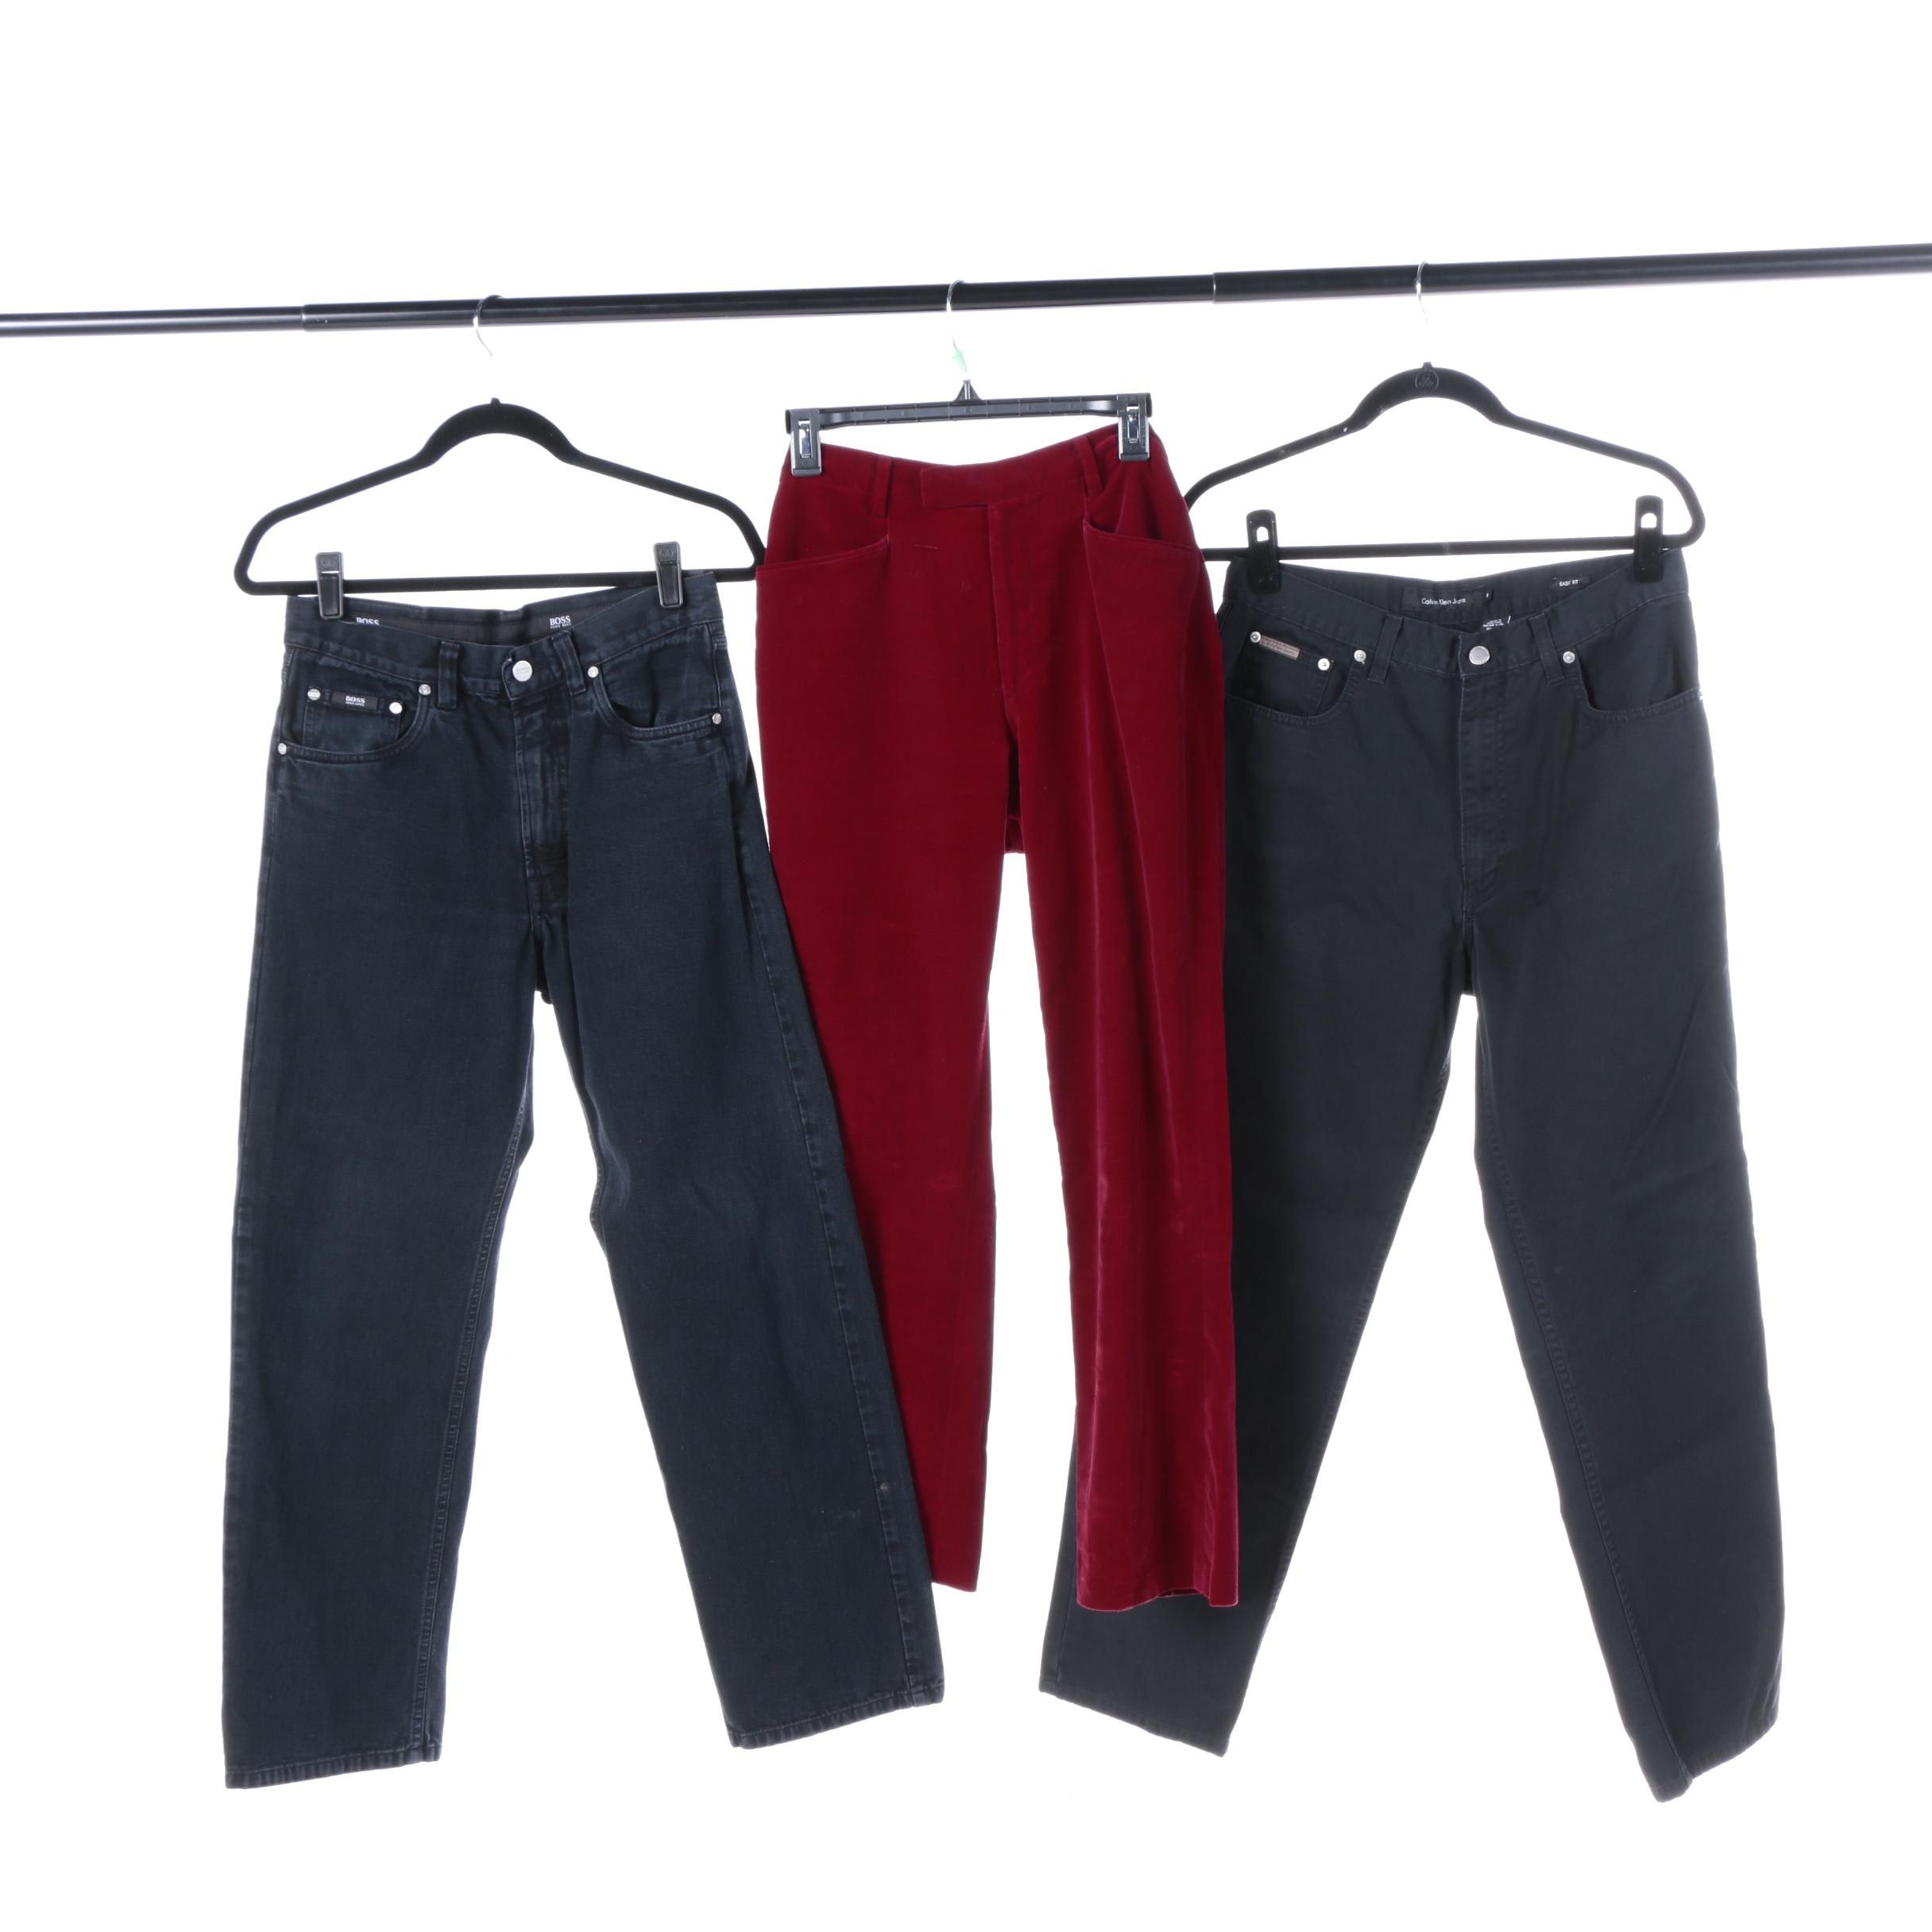 Men's Pants Including Calvin Klein Jeans and BOSS Hugo Boss